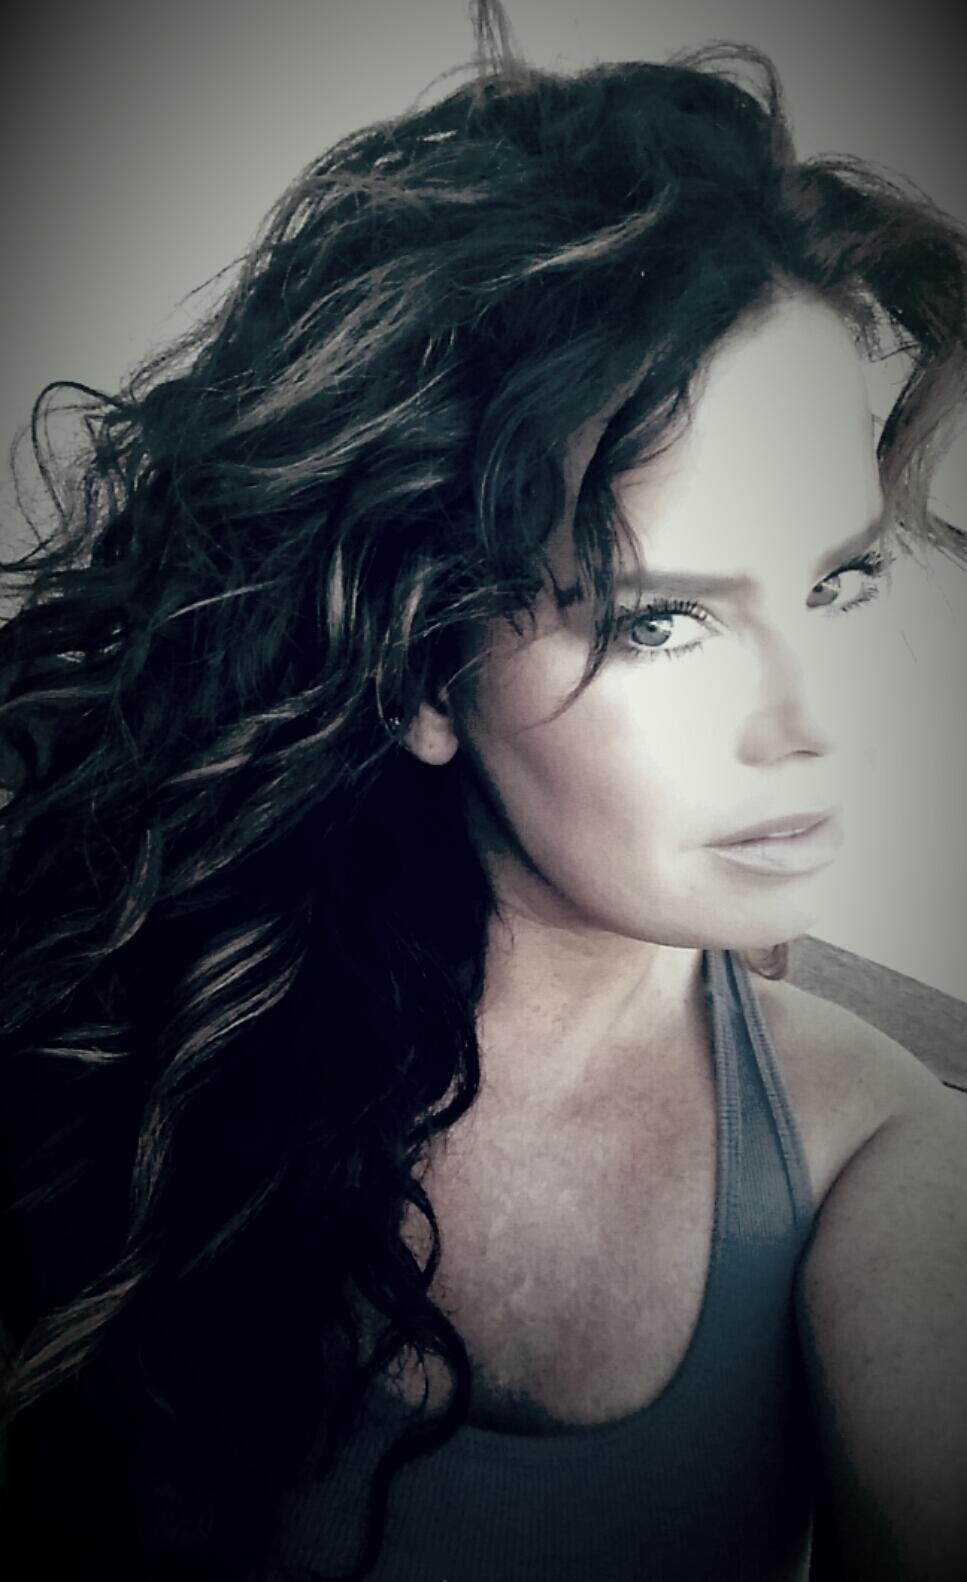 Karin M. Ellis/Owner Licensed Medical Esthetician & Anti-aging Specialist